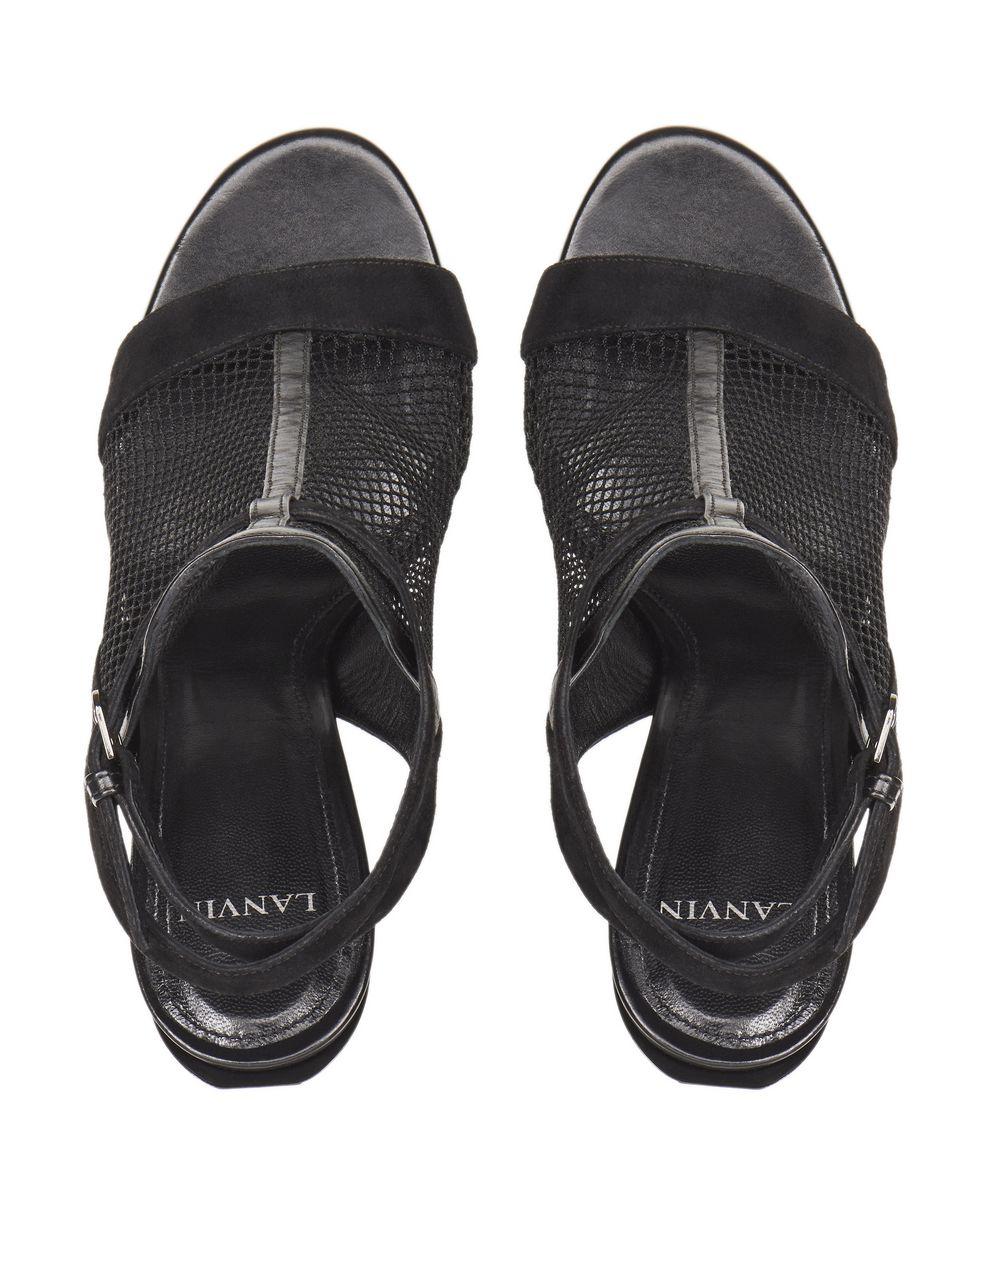 BLACK MESH SANDAL - Lanvin